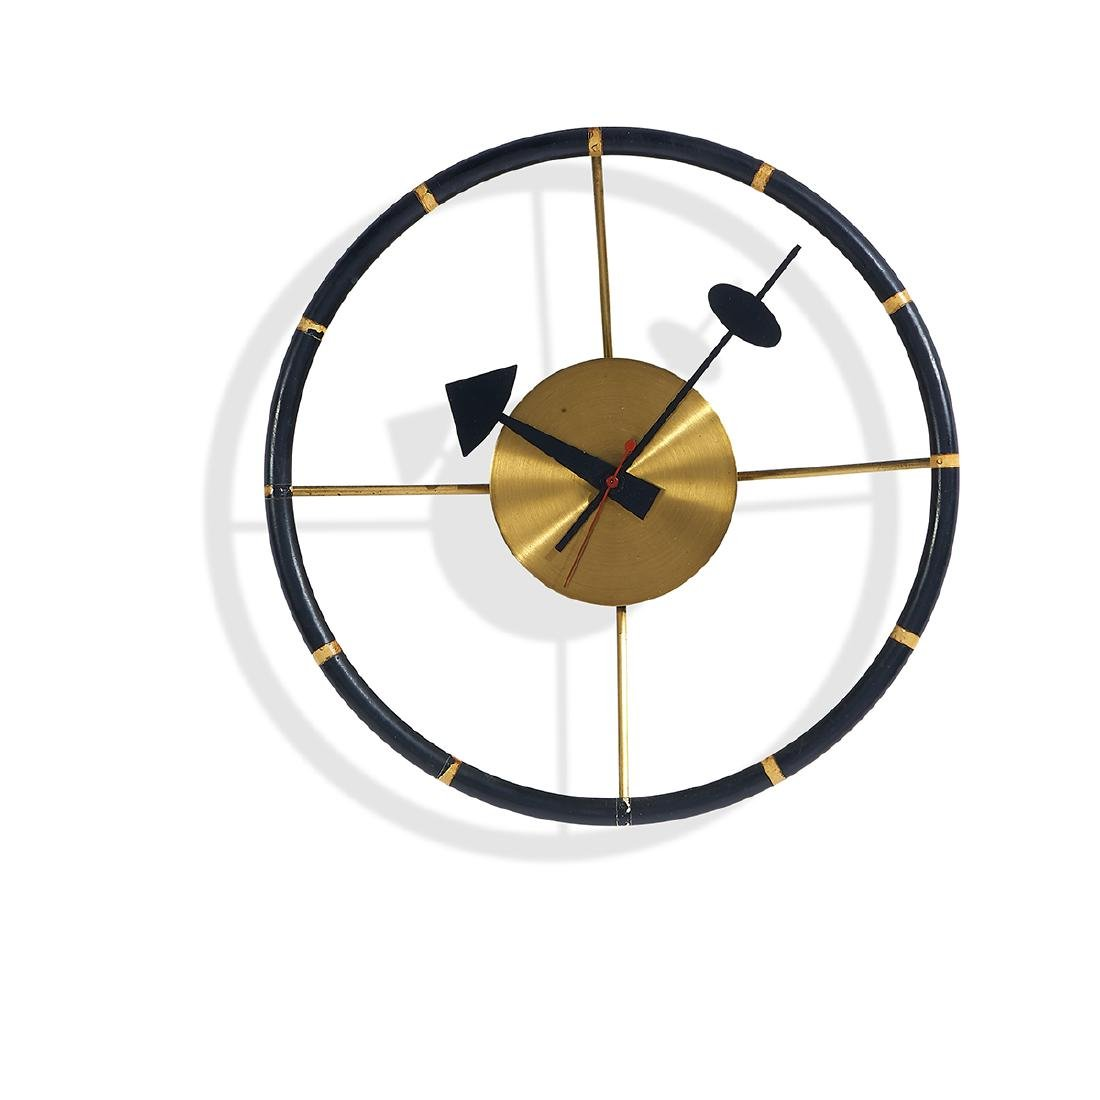 George Nelson Associates Steering Wheel clock